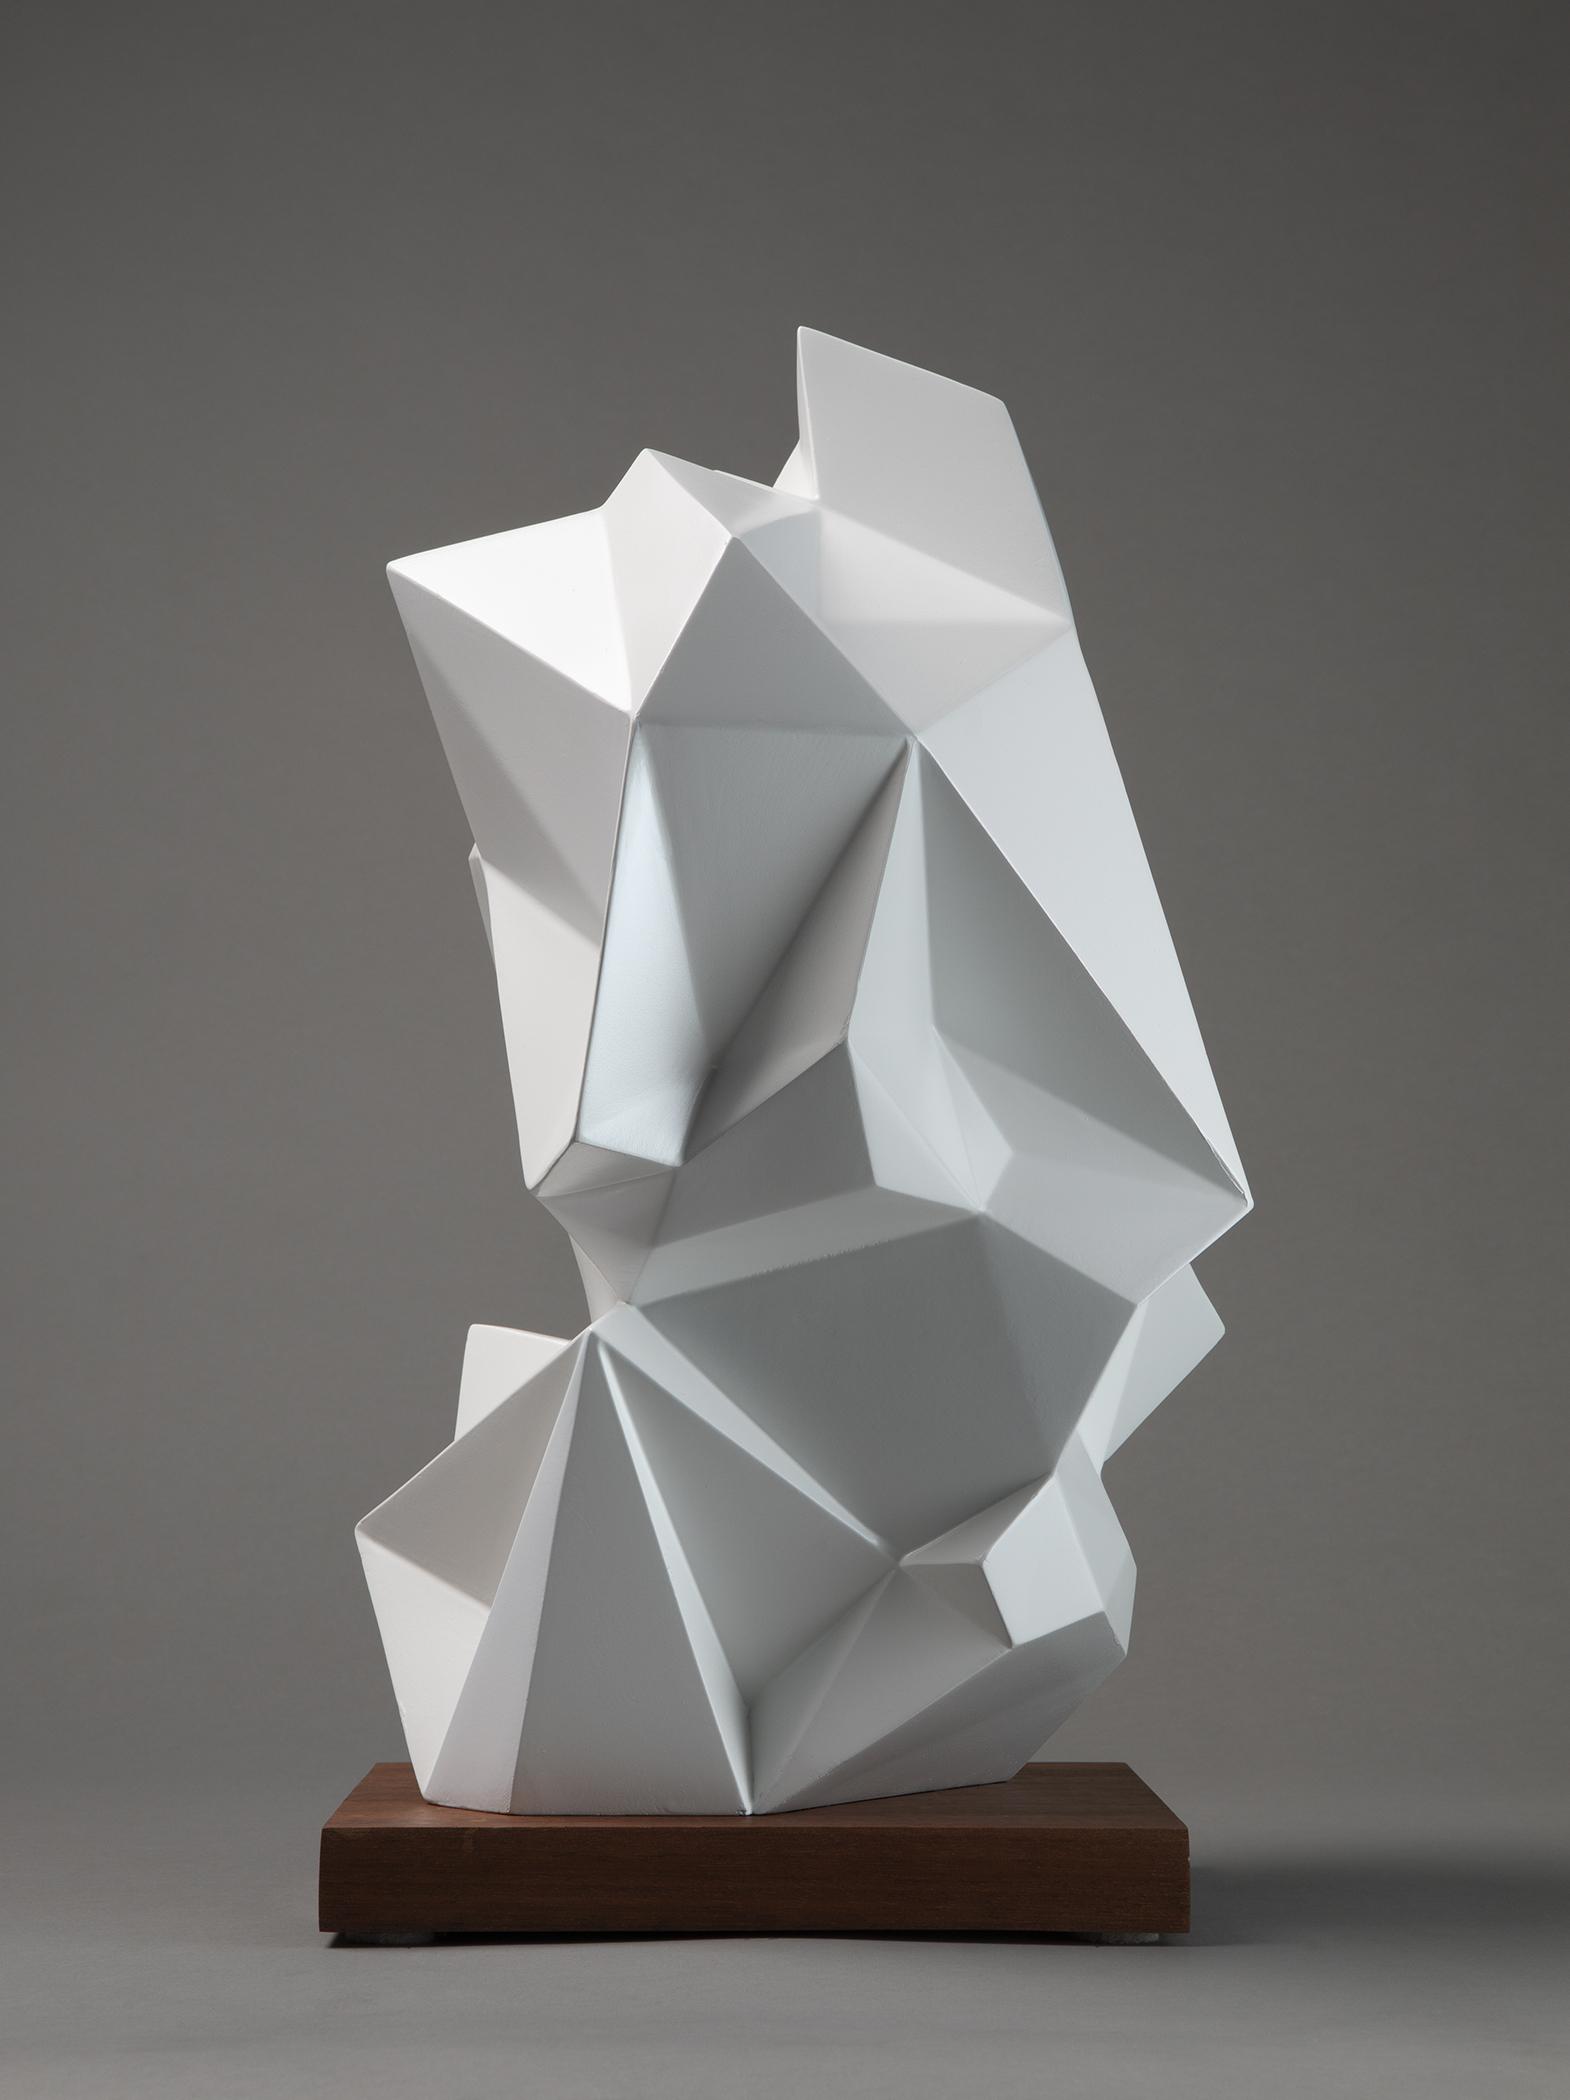 white sculpture-view 02-297-final-small.jpg